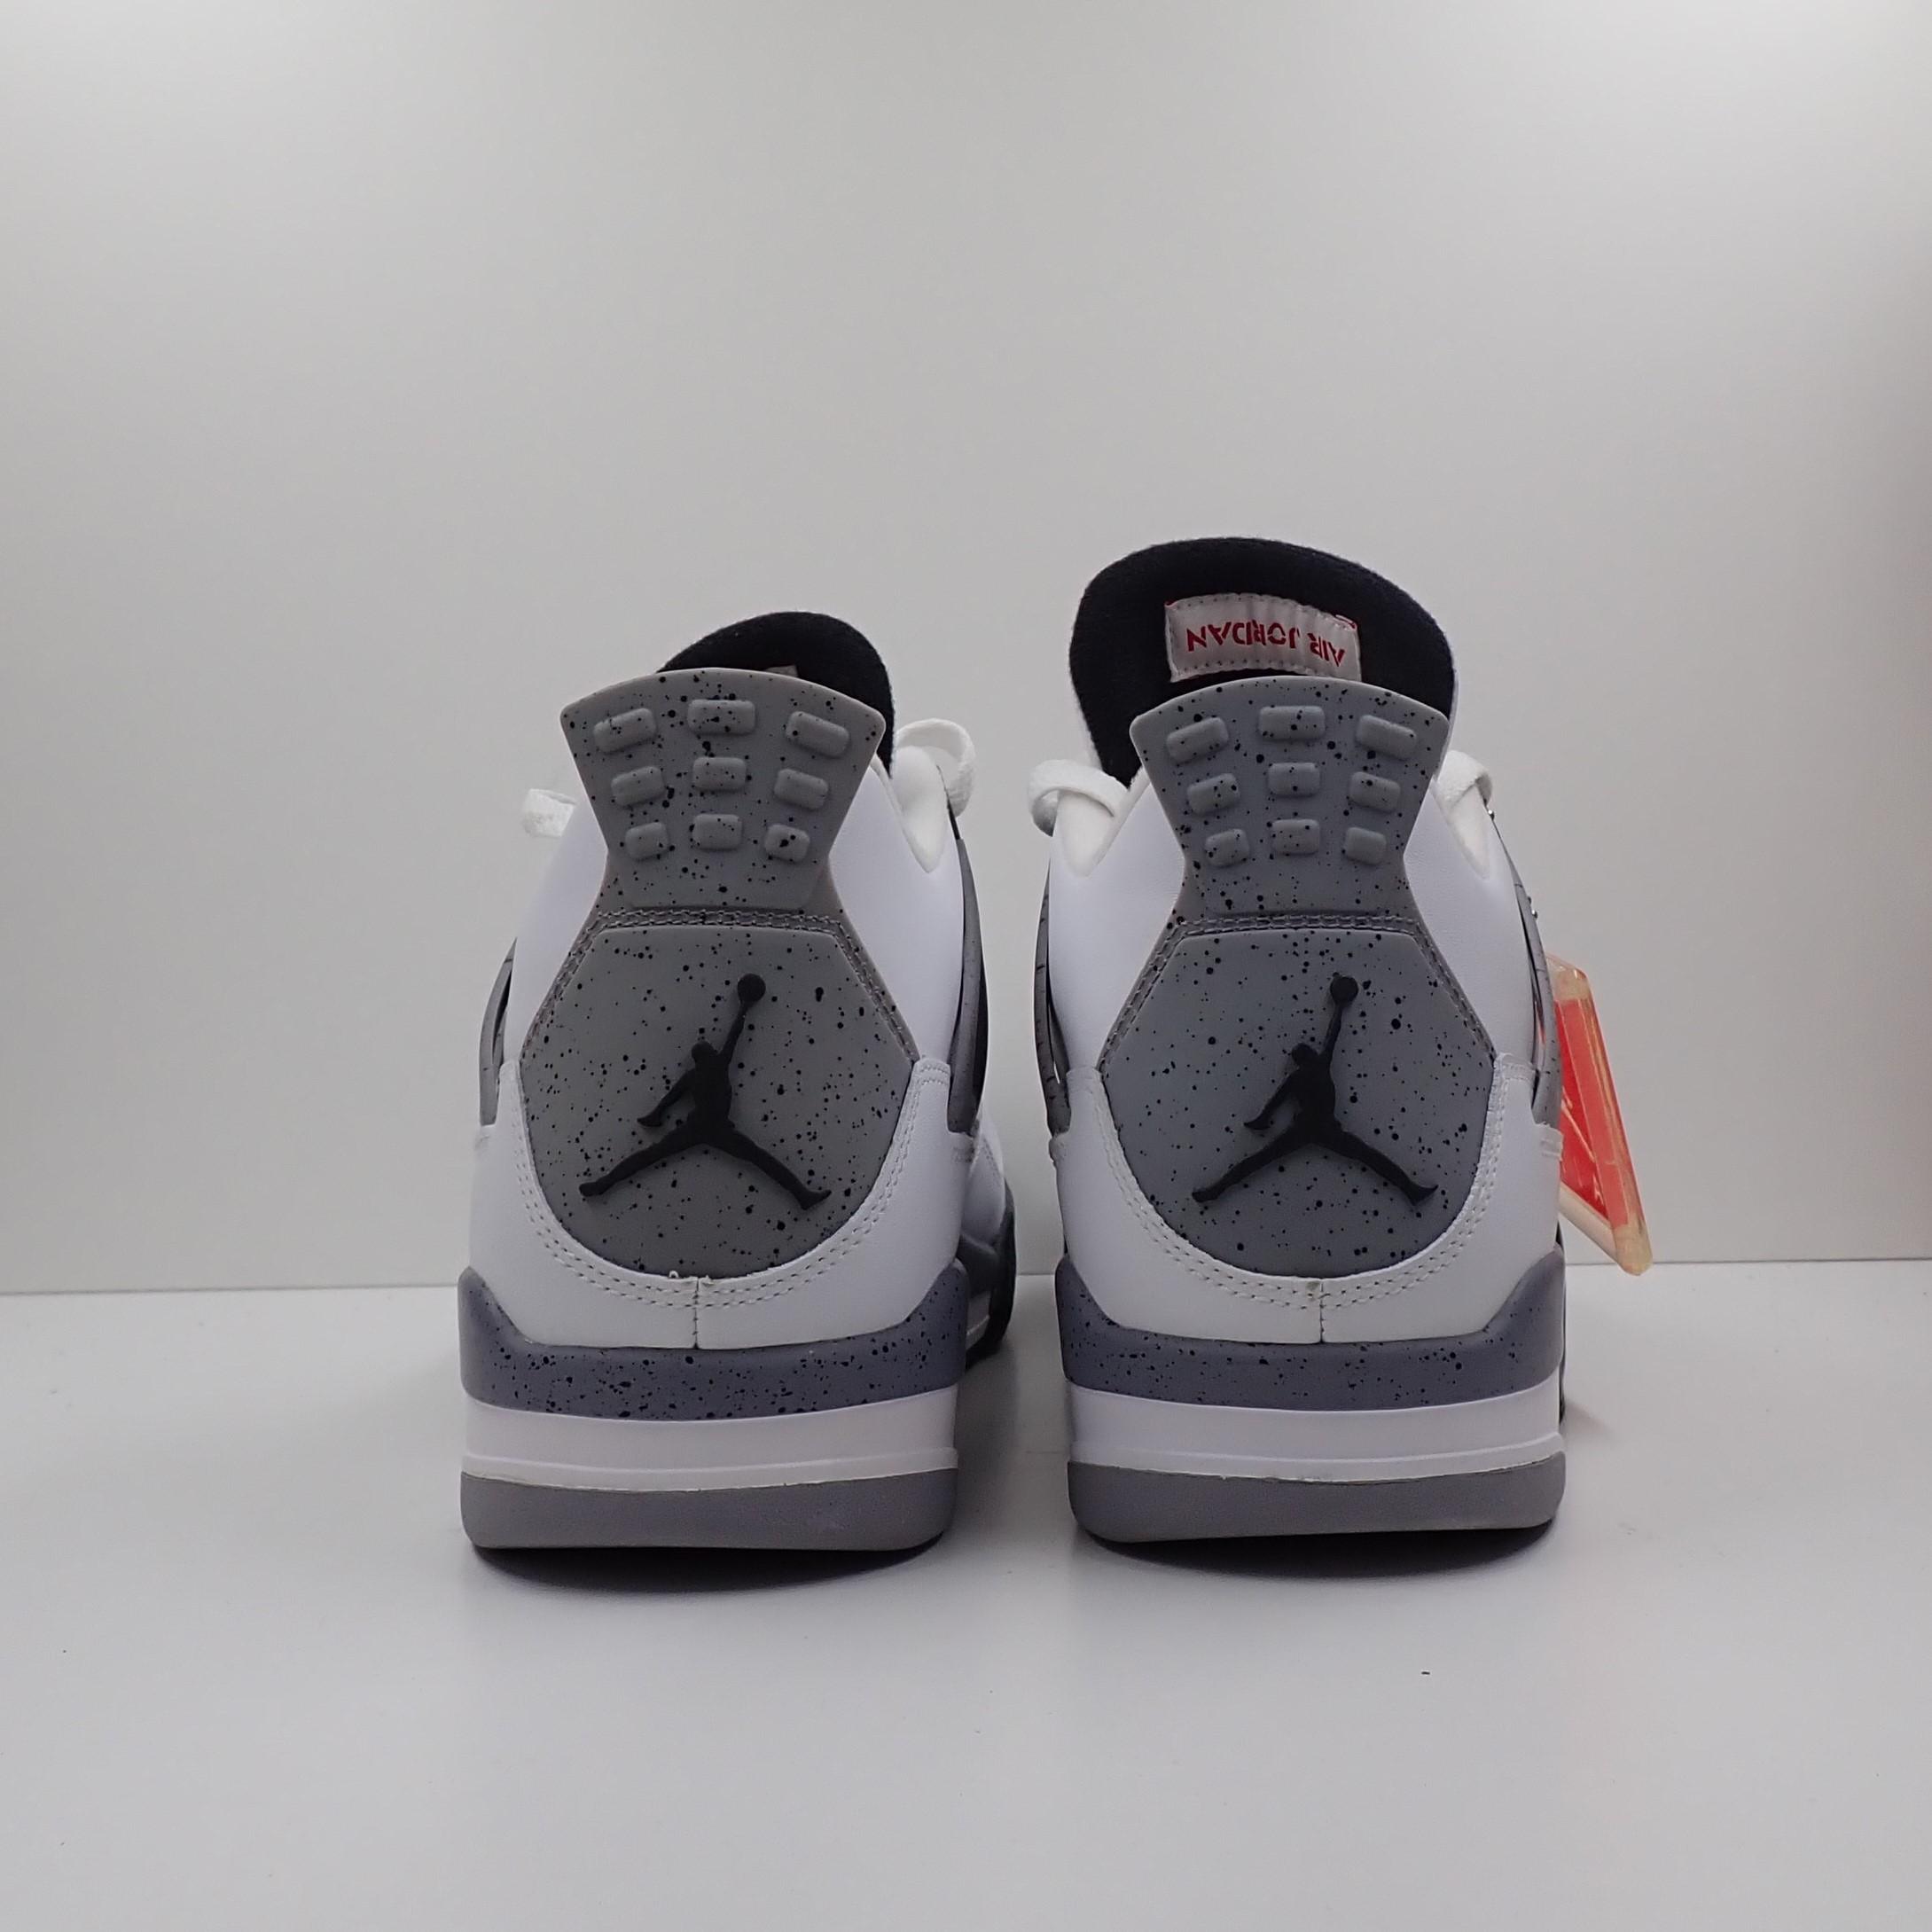 Jordan 4 Retro White Cement (2012)